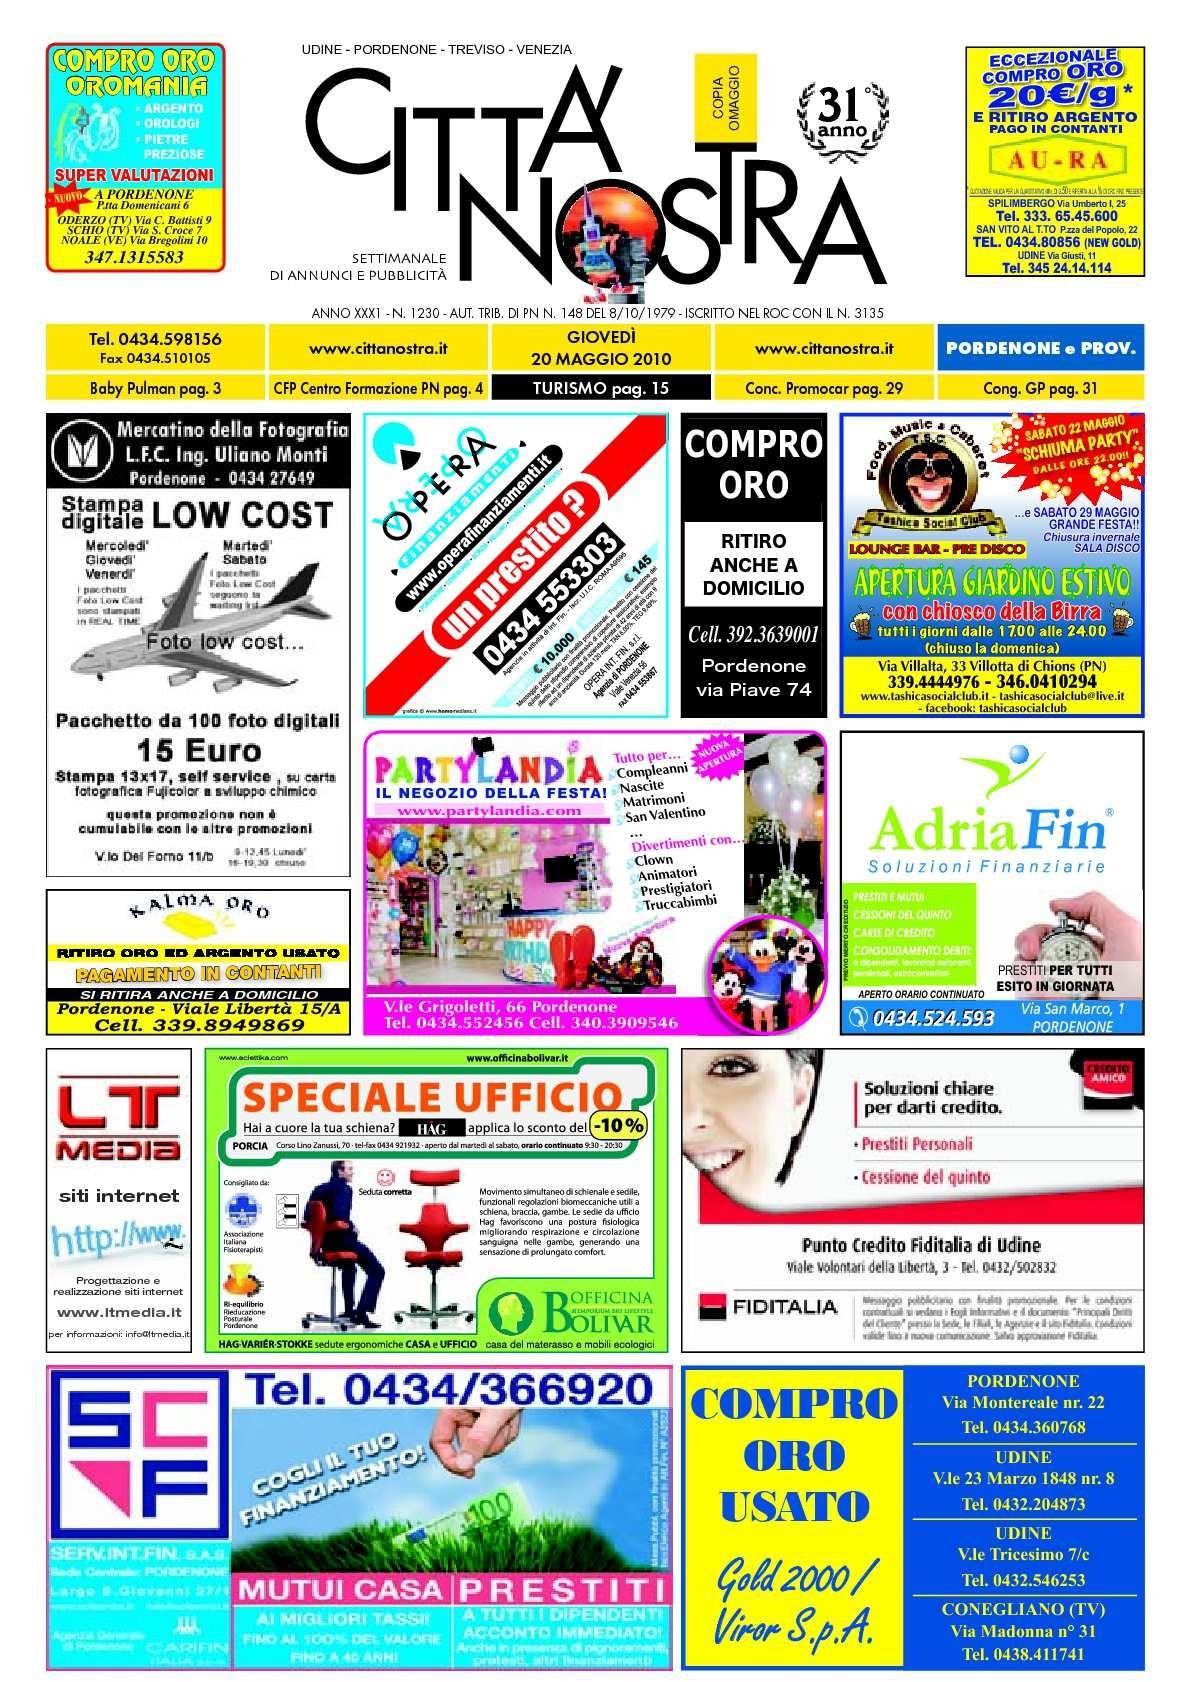 Calendario 2020 Gennaio Más Caliente Calaméo Citt Nostra Pordenone Del 20 05 2010 N 1230 Of Calendario 2020 Gennaio Más Actual Calendario 2019 Excel